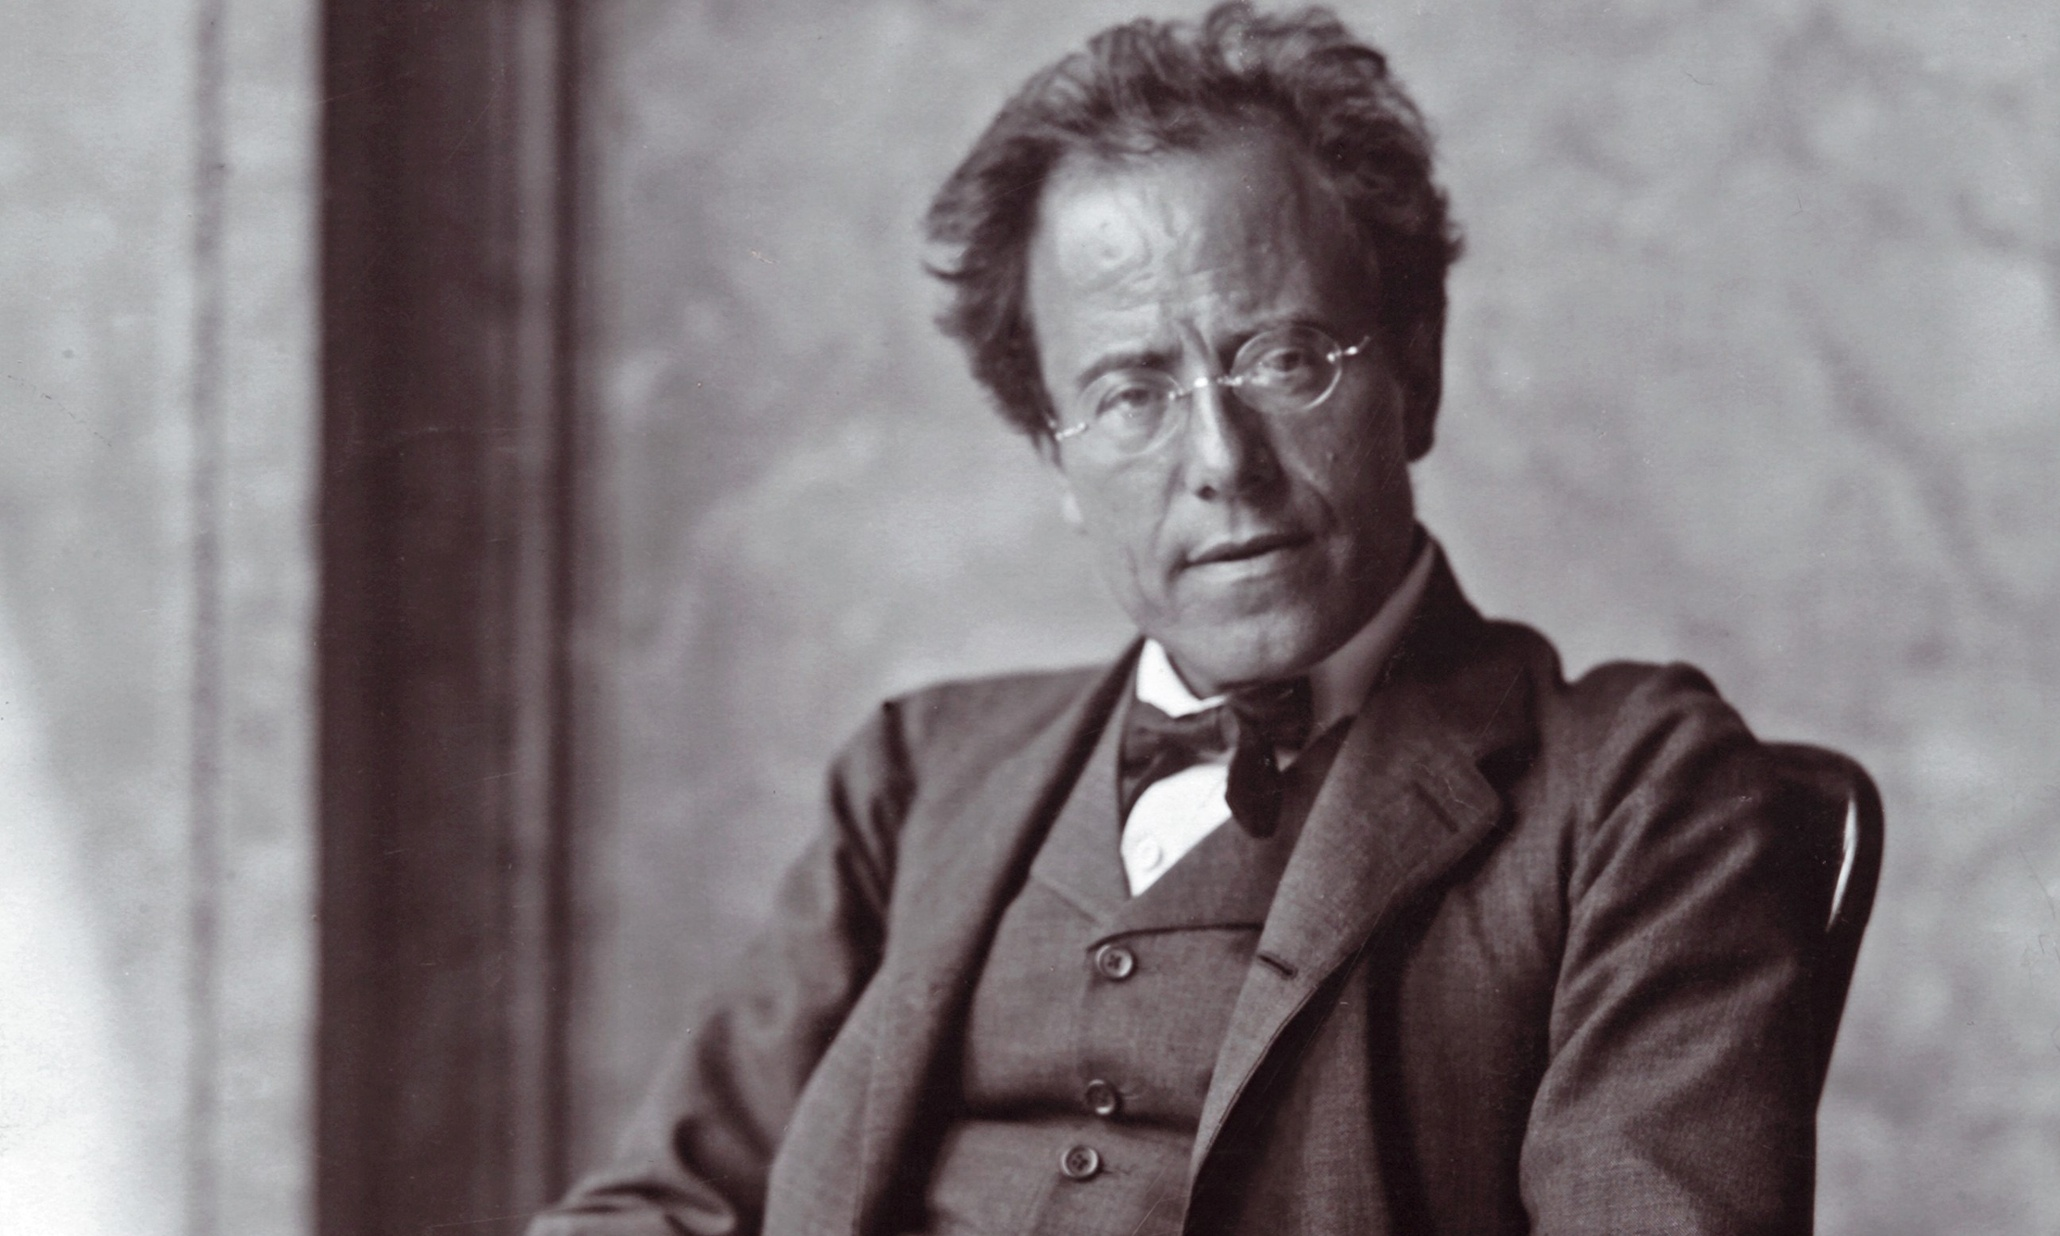 The Austrian composer Gustav Mahler. Photograph by Moriz Nähr. 1907.